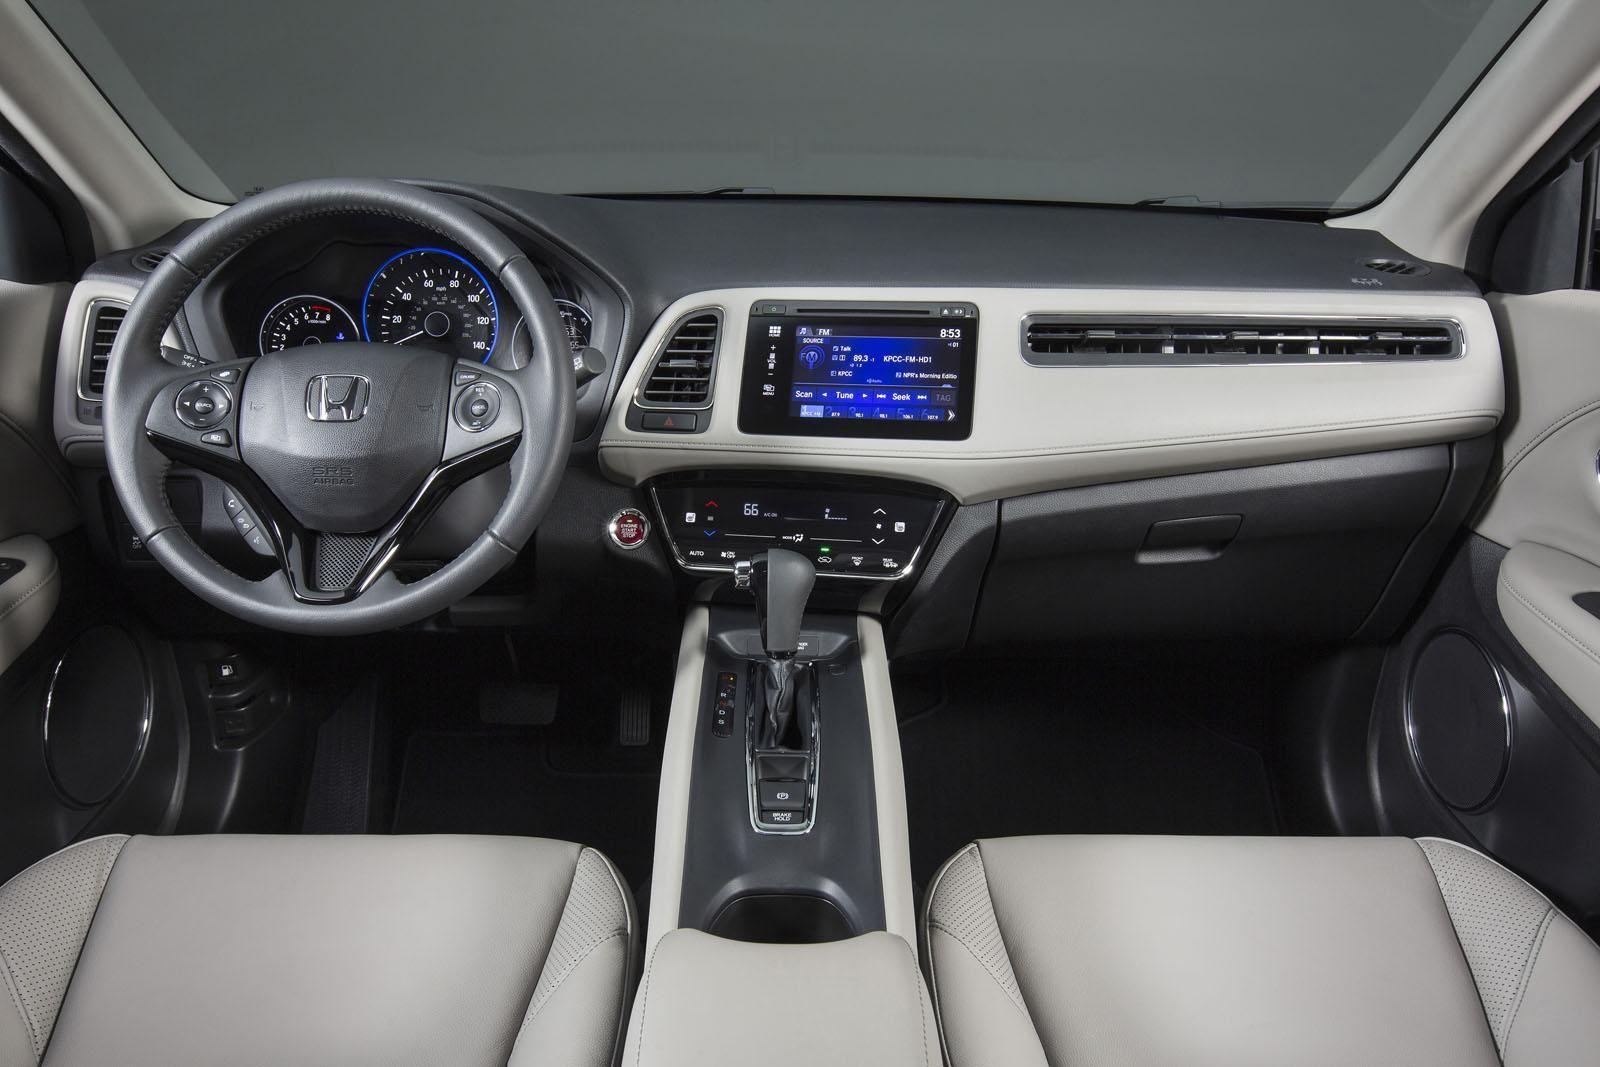 2016 Honda Hrv Interior Interior De Carros De Luxo Carros De Luxo Honda Hr V